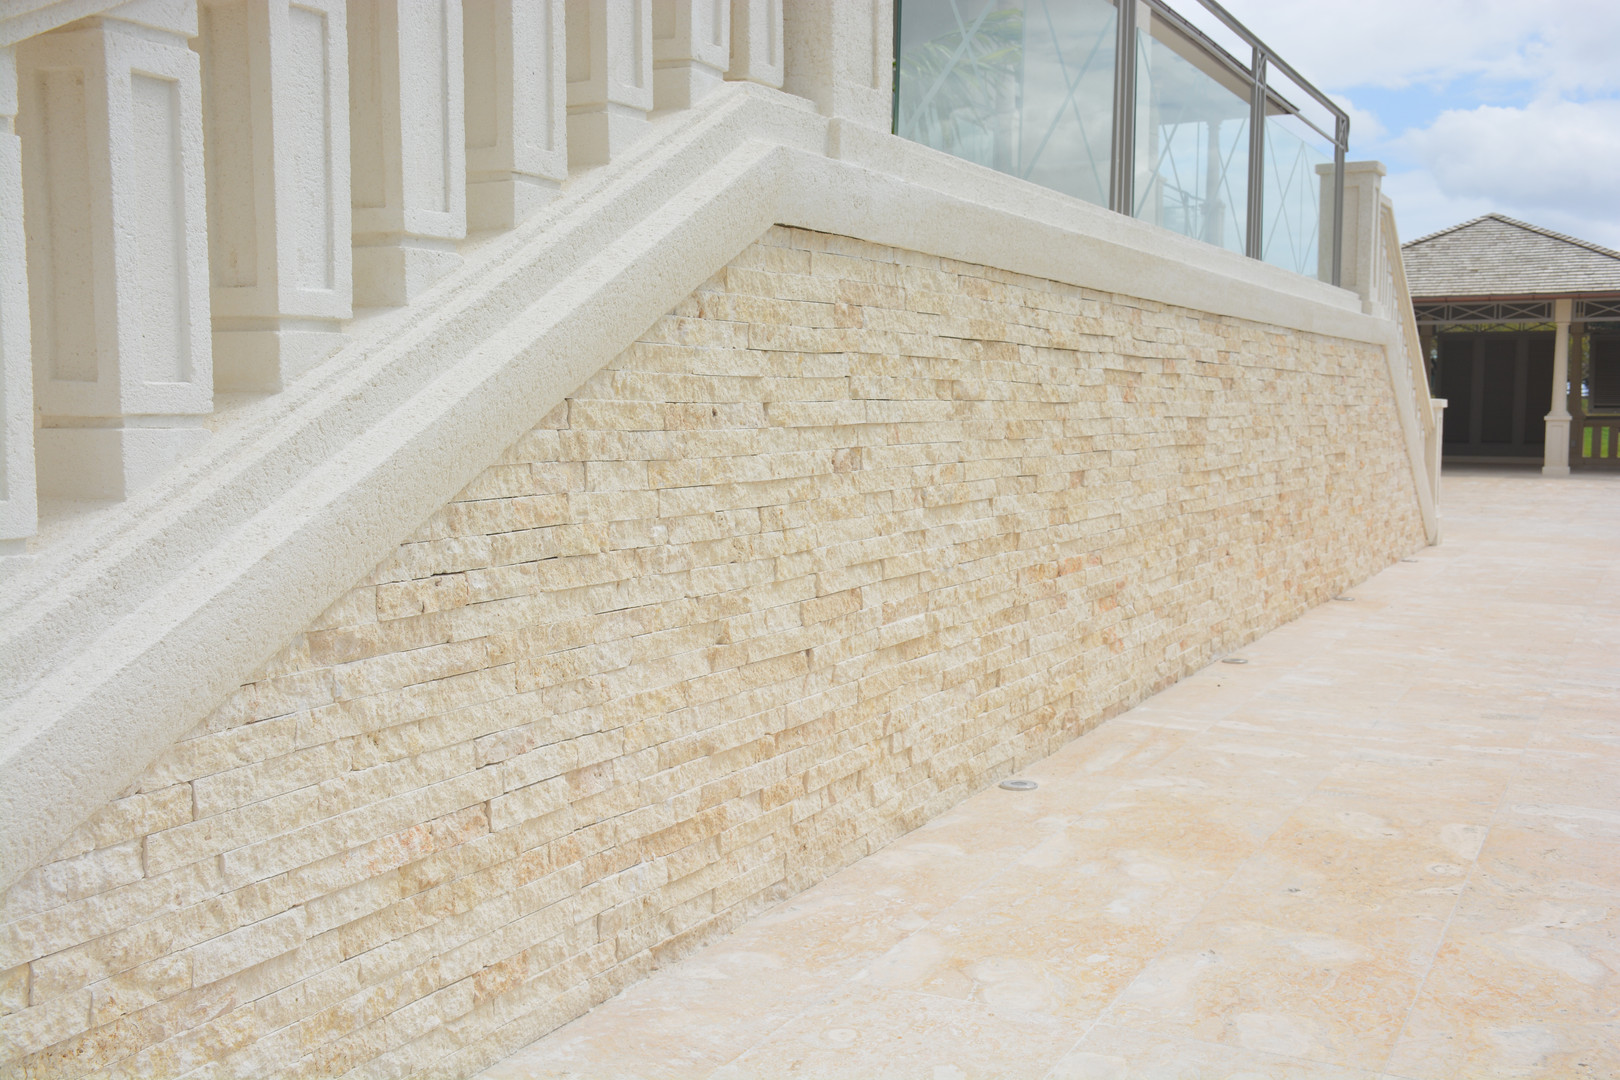 Tiles Used: SHELLSTONE